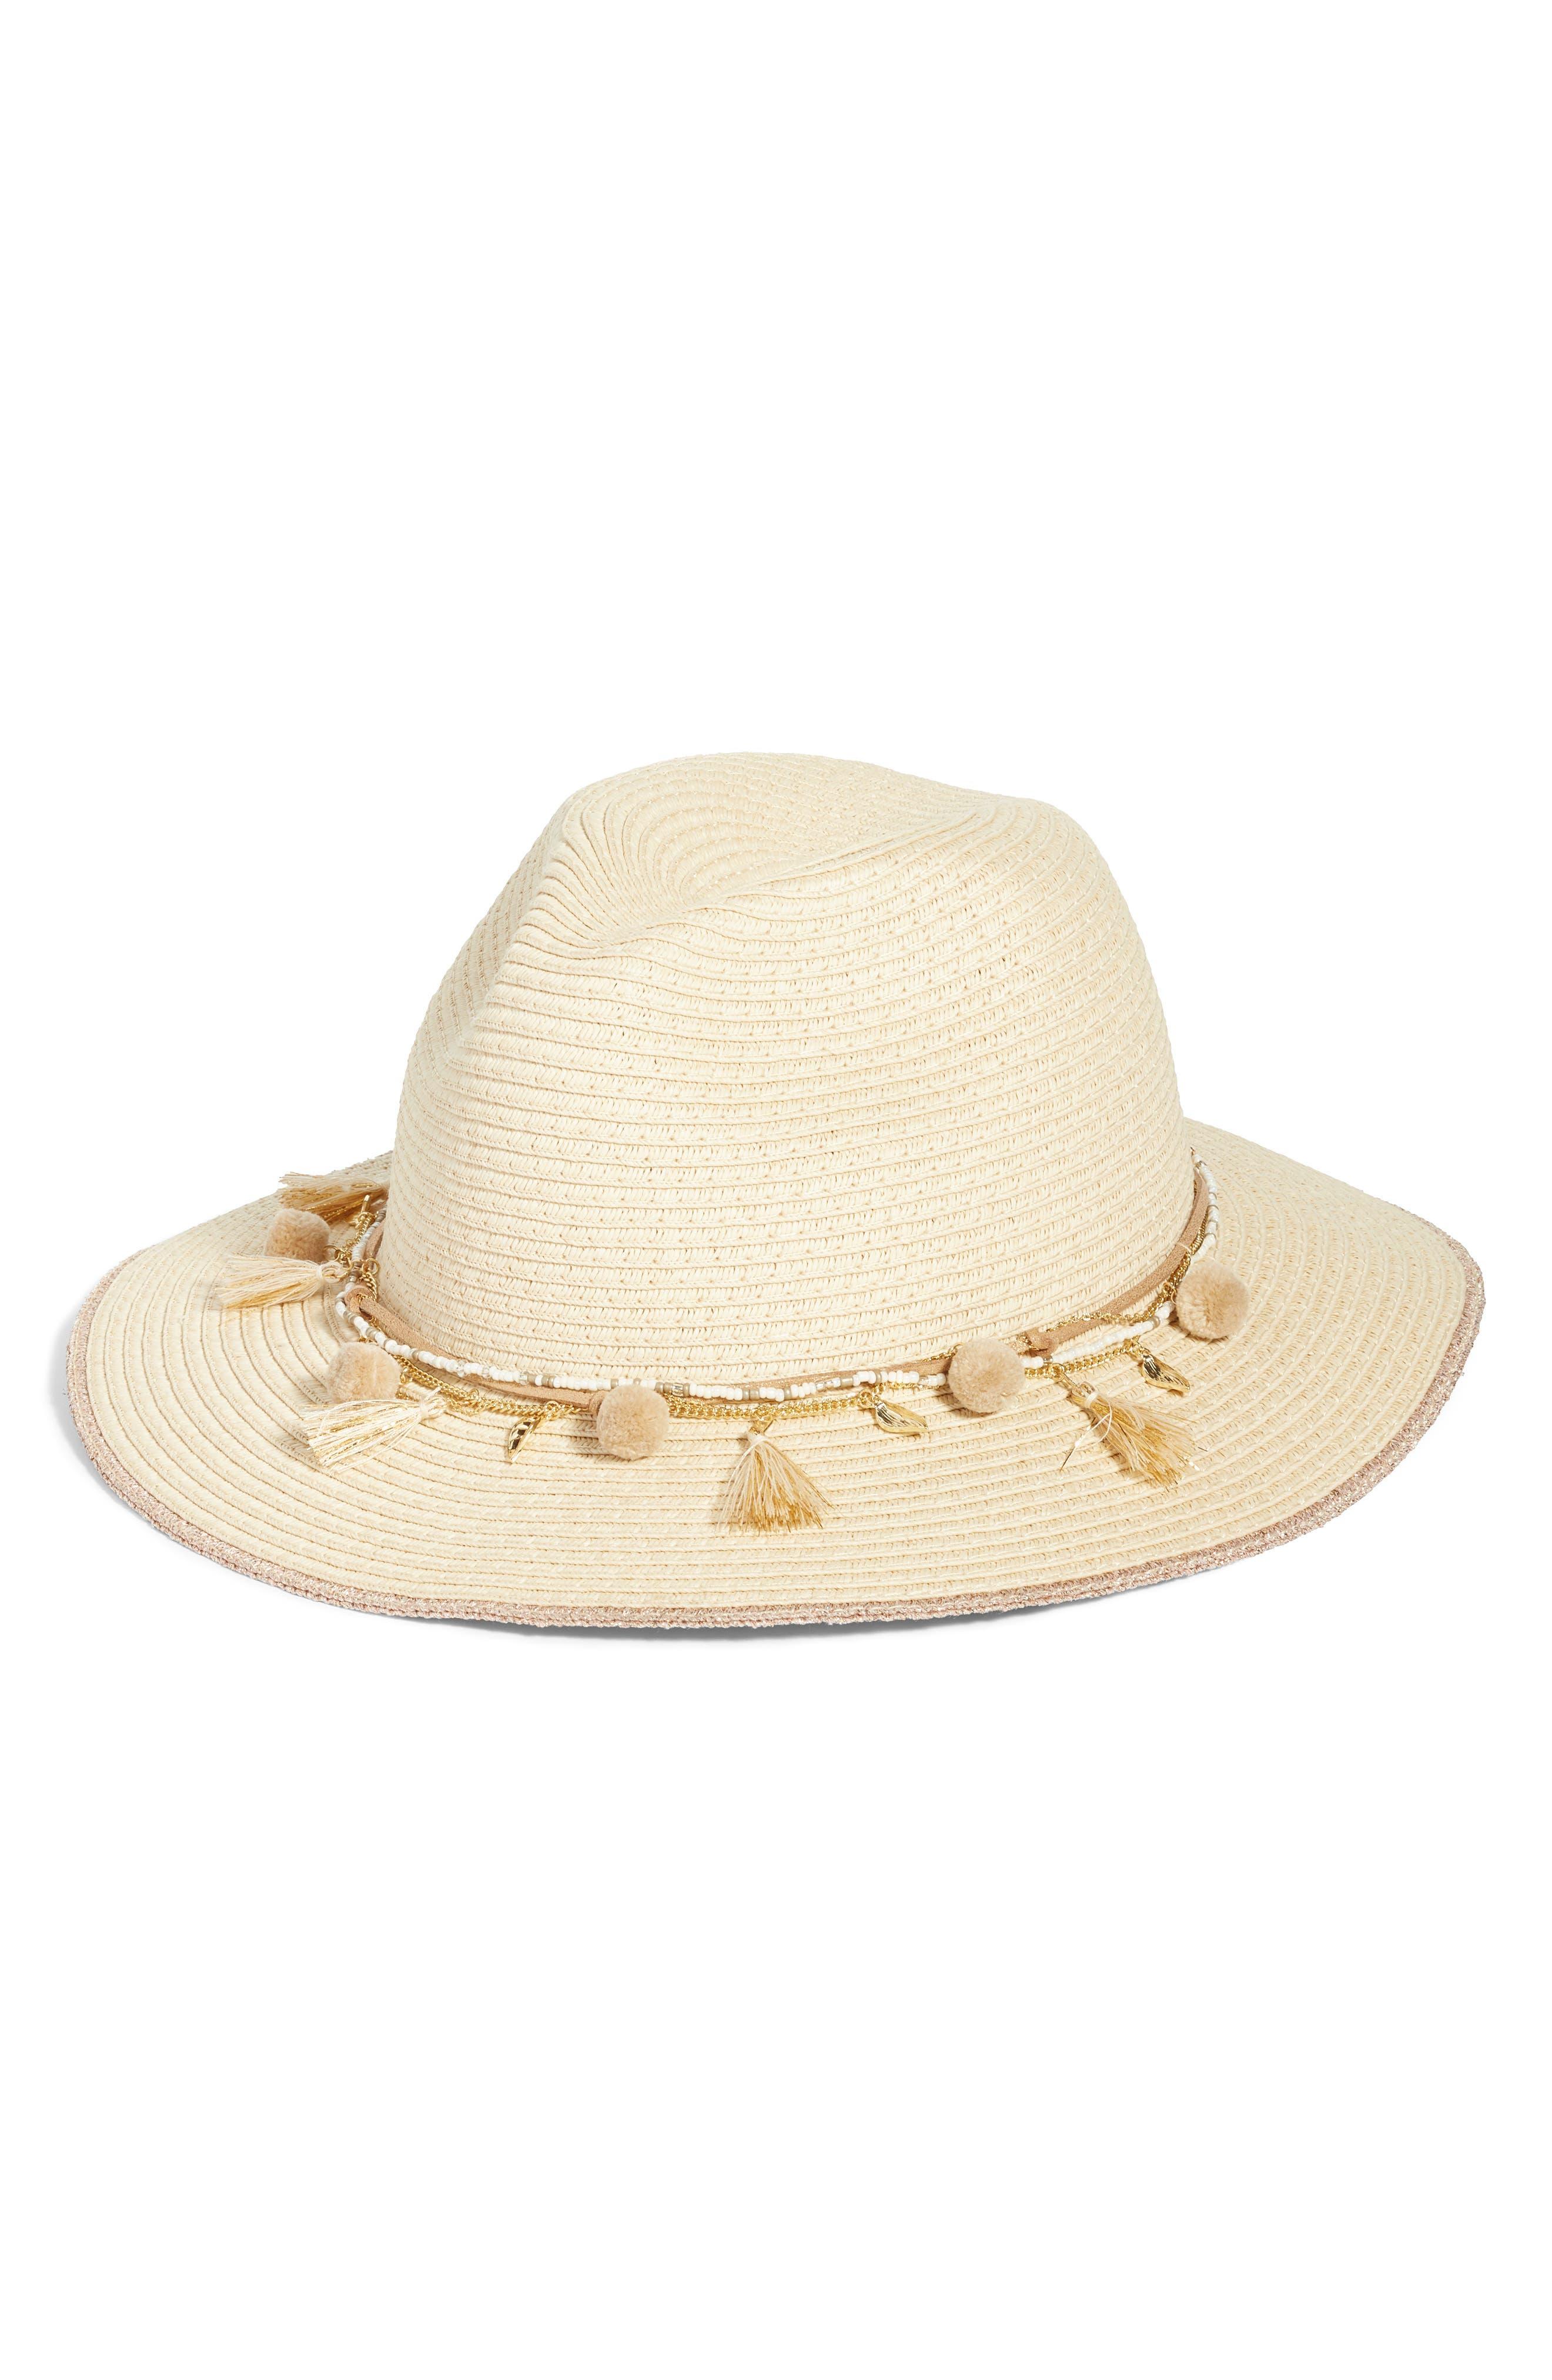 Corella Panama Hat,                             Main thumbnail 1, color,                             White